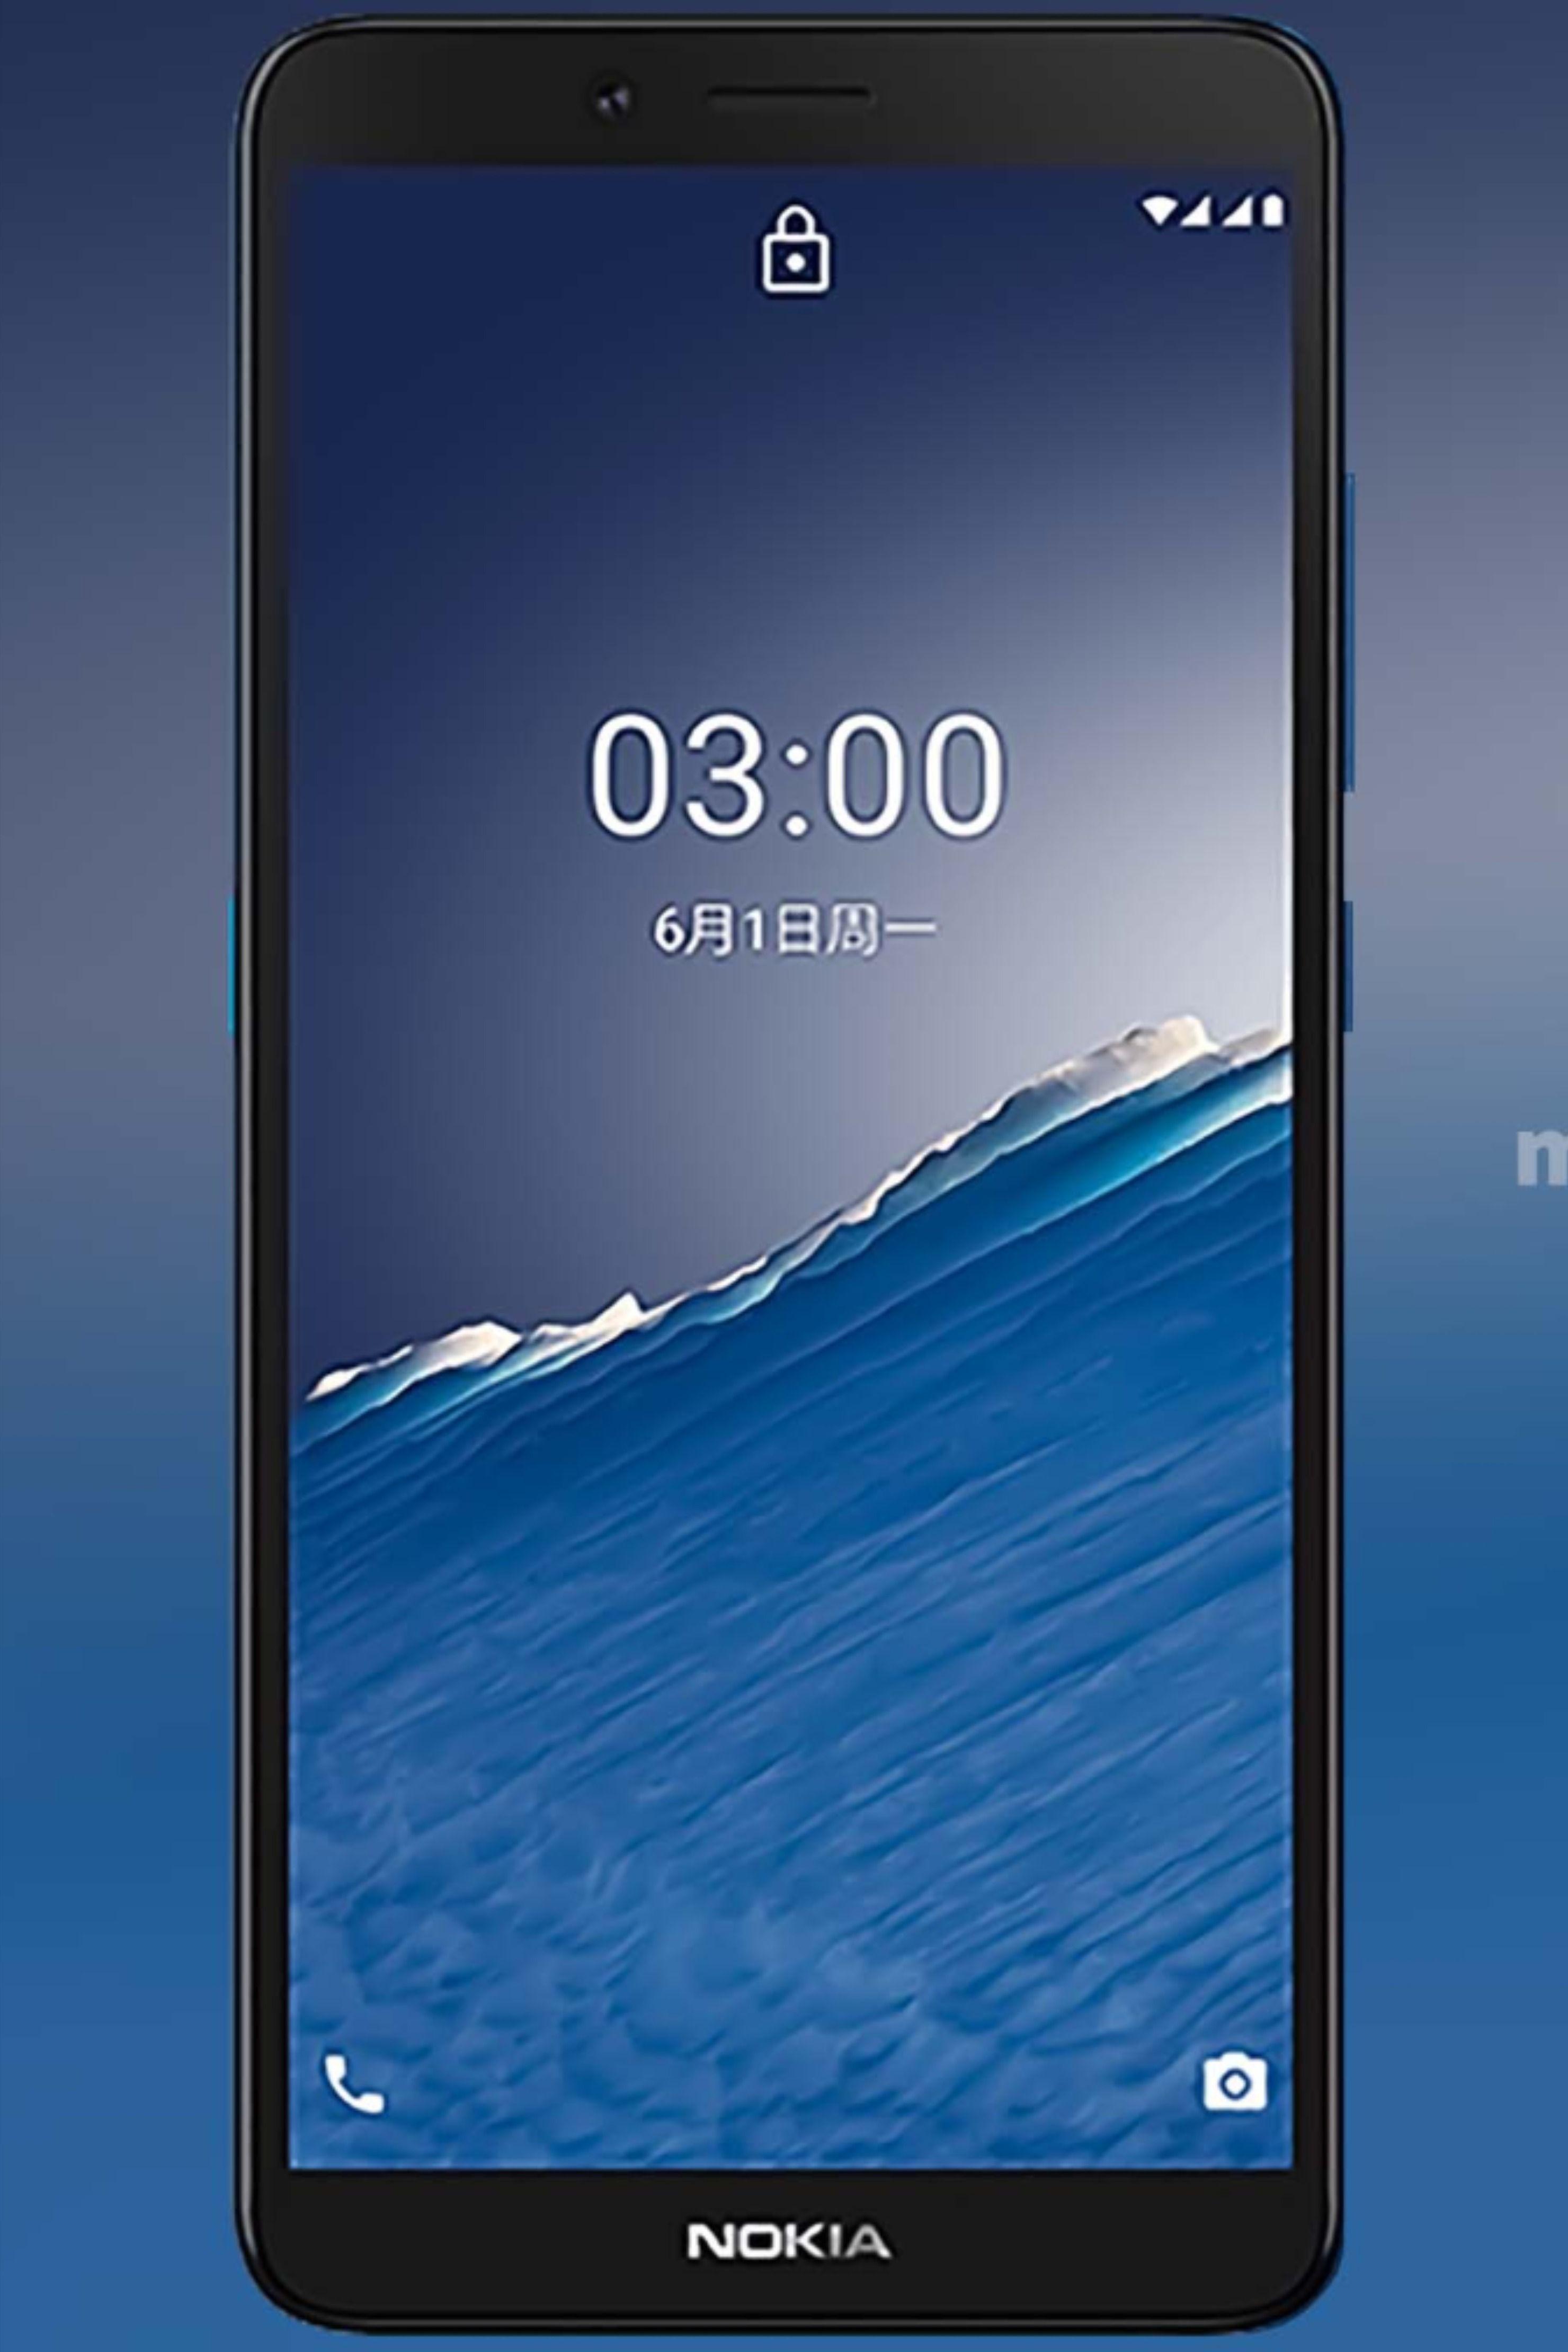 Nokia C3 (mobilespecification8) 02 in 2020 Nokia